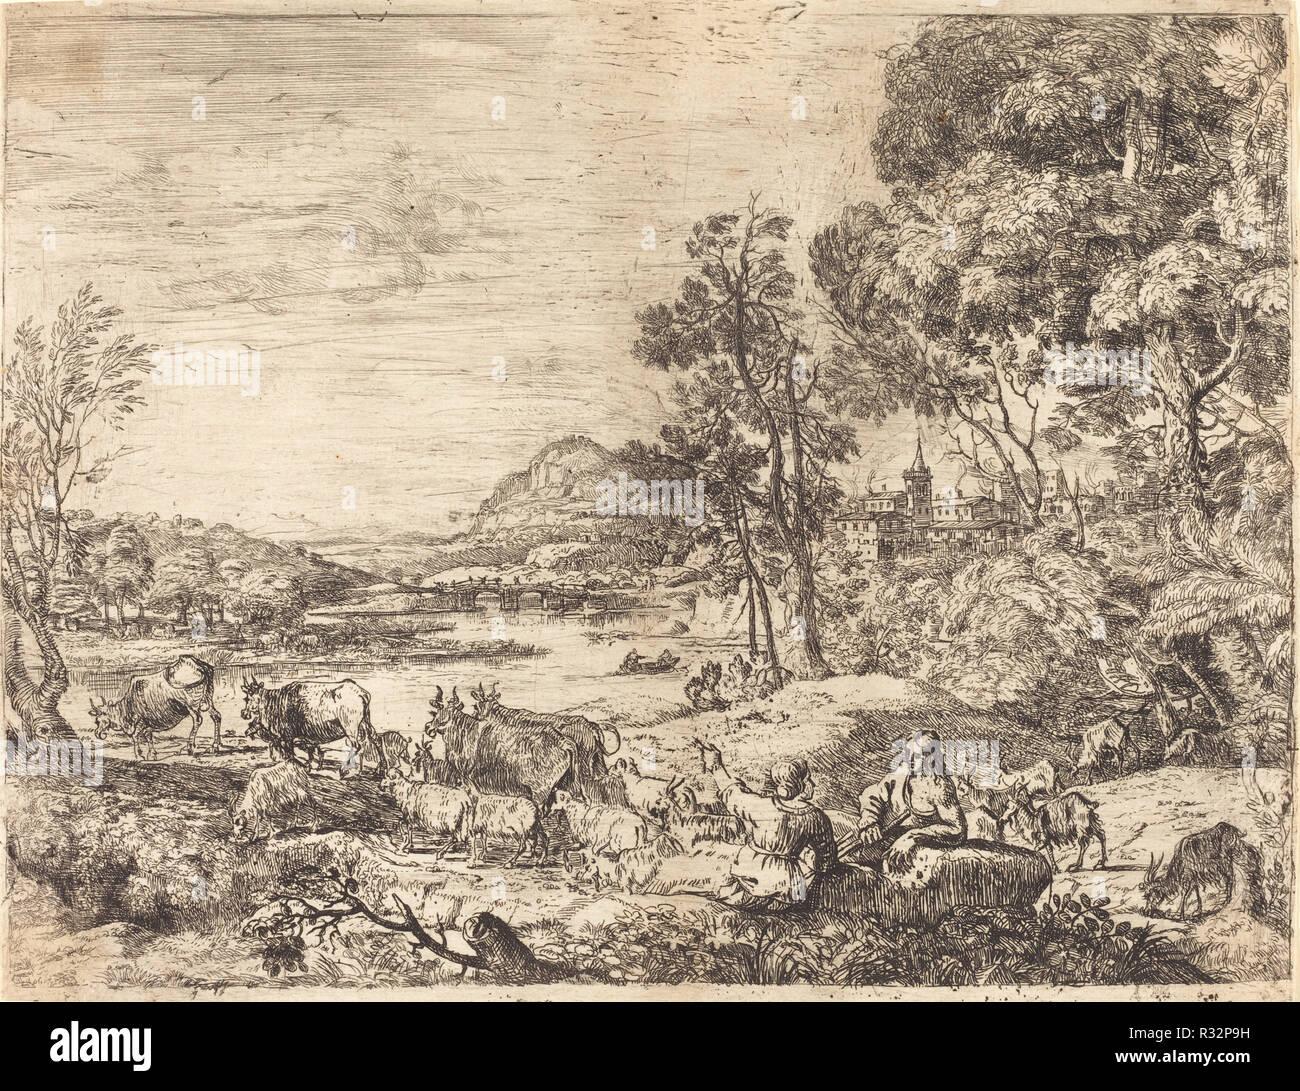 Shepherd and Shepherdess Conversing in a Landscape (Berger et bergère  conversant). Dated: